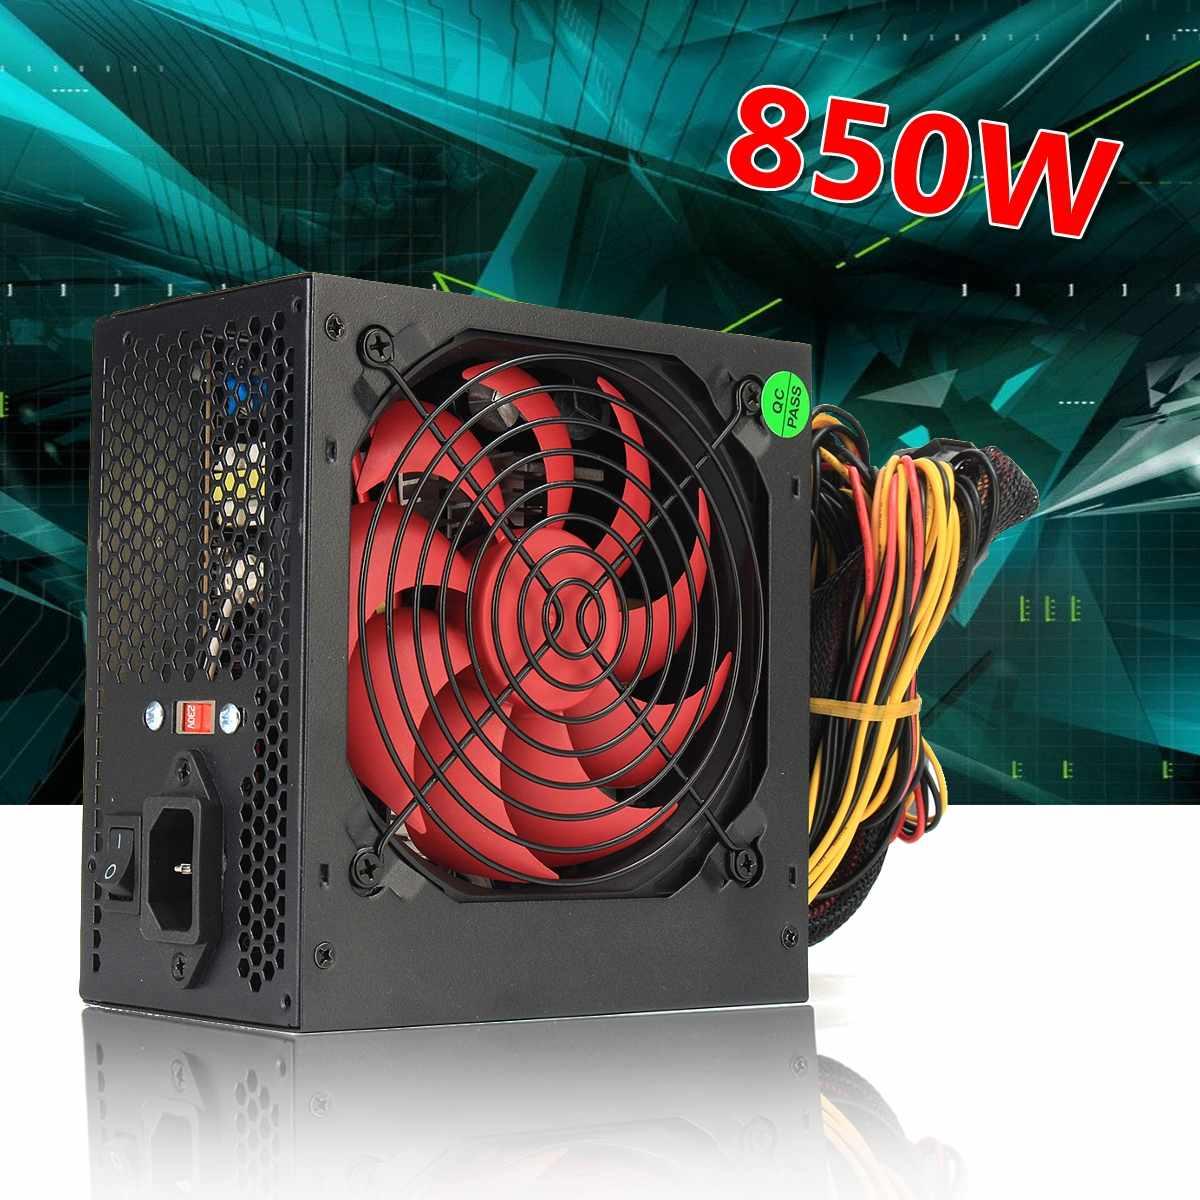 US/AU/EU Plug 850W 850 Watt BTC Power Supply 120mm Fan 24 Pin PCI SATA ATX 12V Molex Connect Miner Computer Power Supply